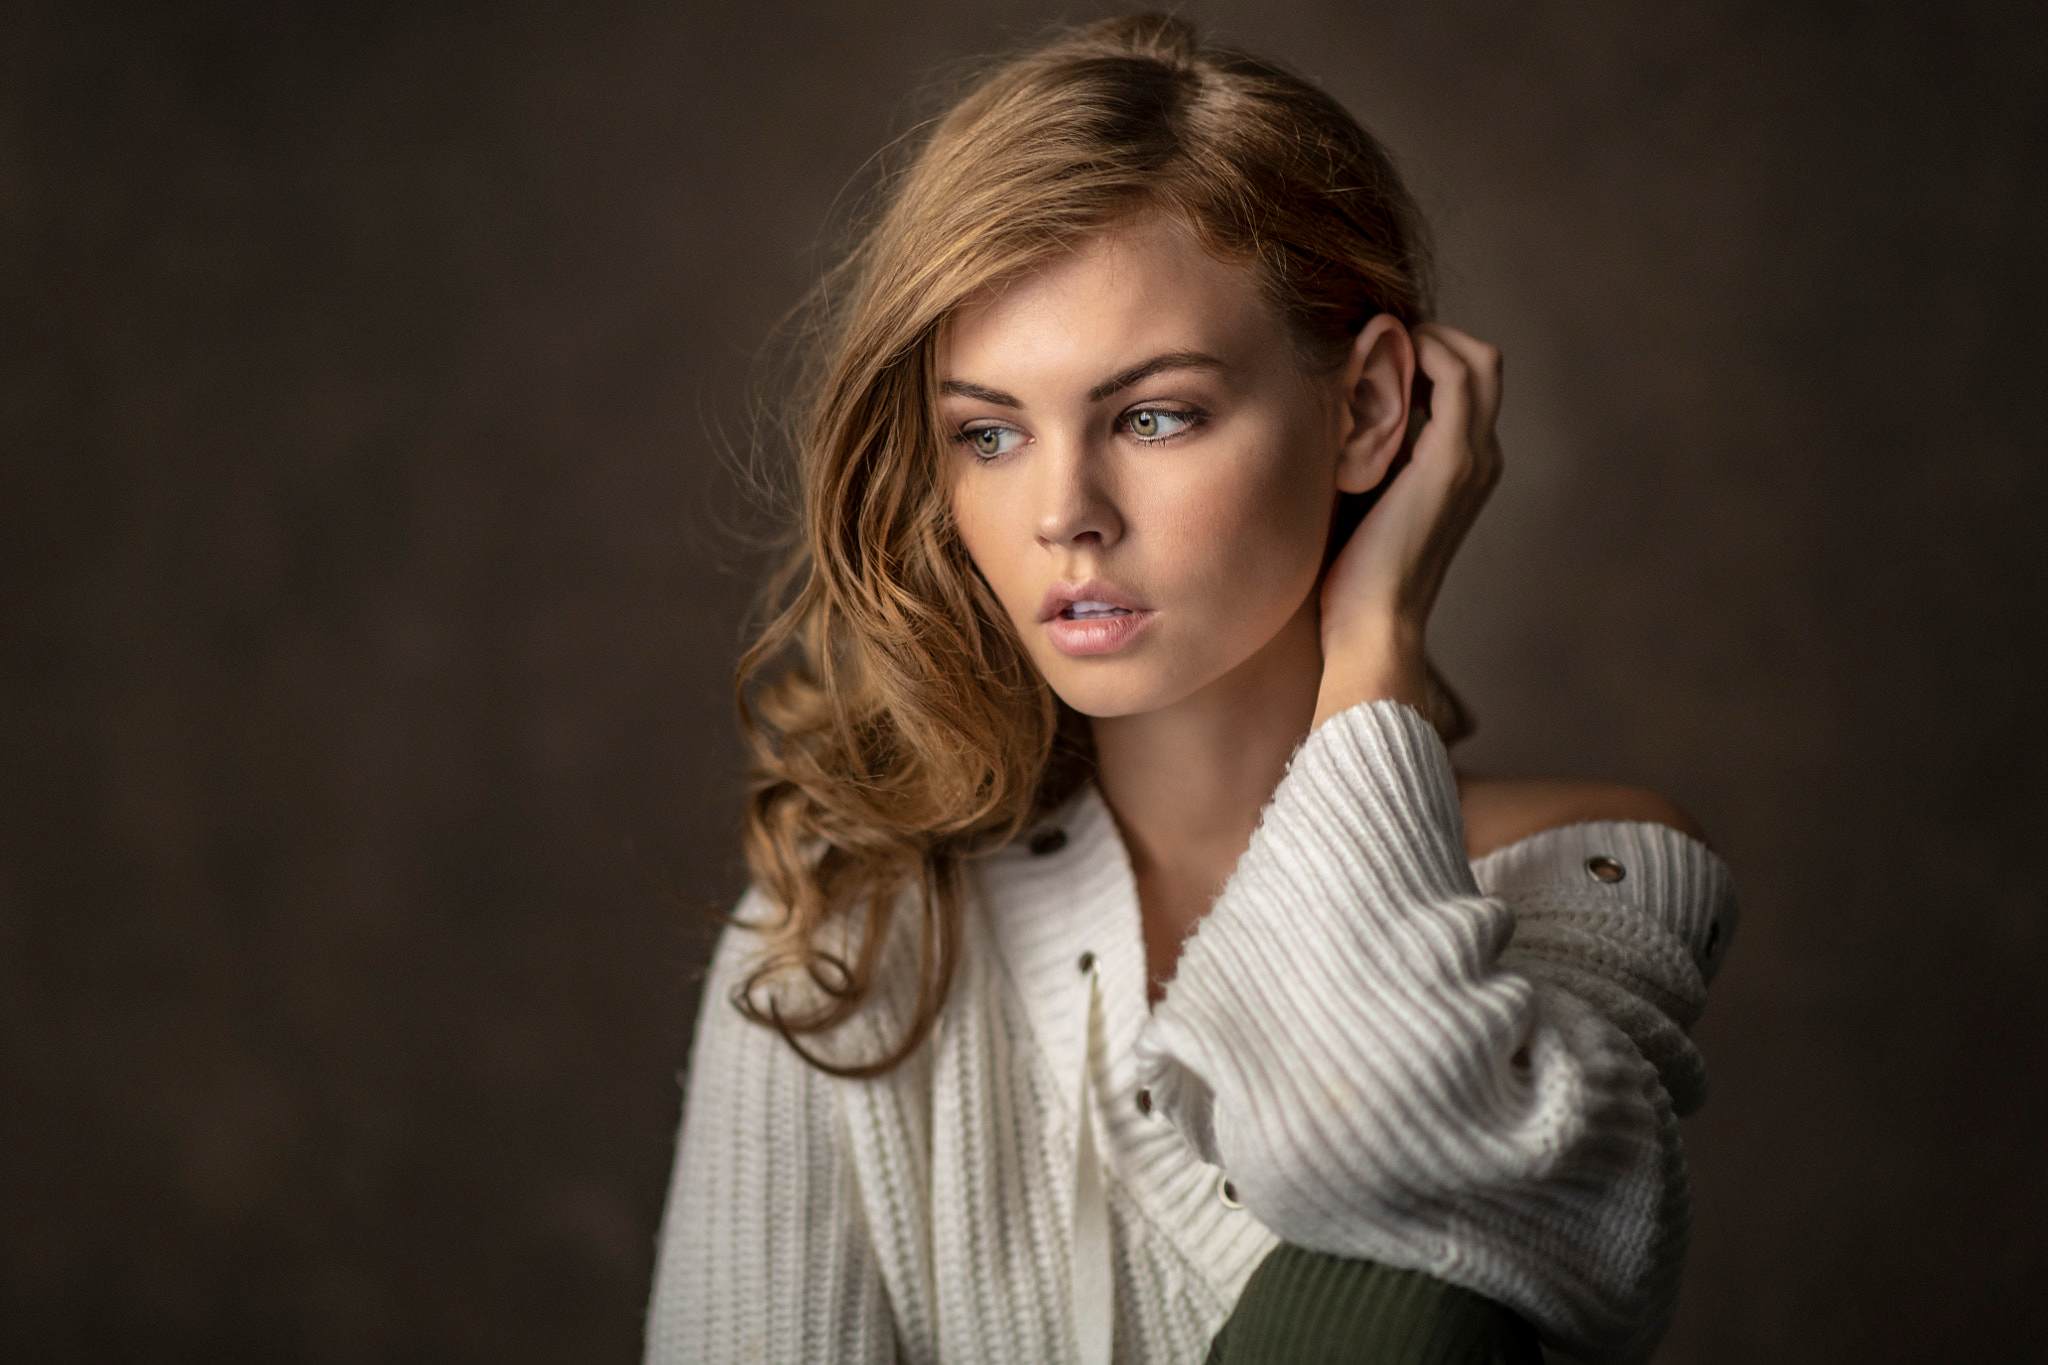 Women Blonde Portrait Pink Lipstick Long Hair Women Indoors Looking Away 2048x1365